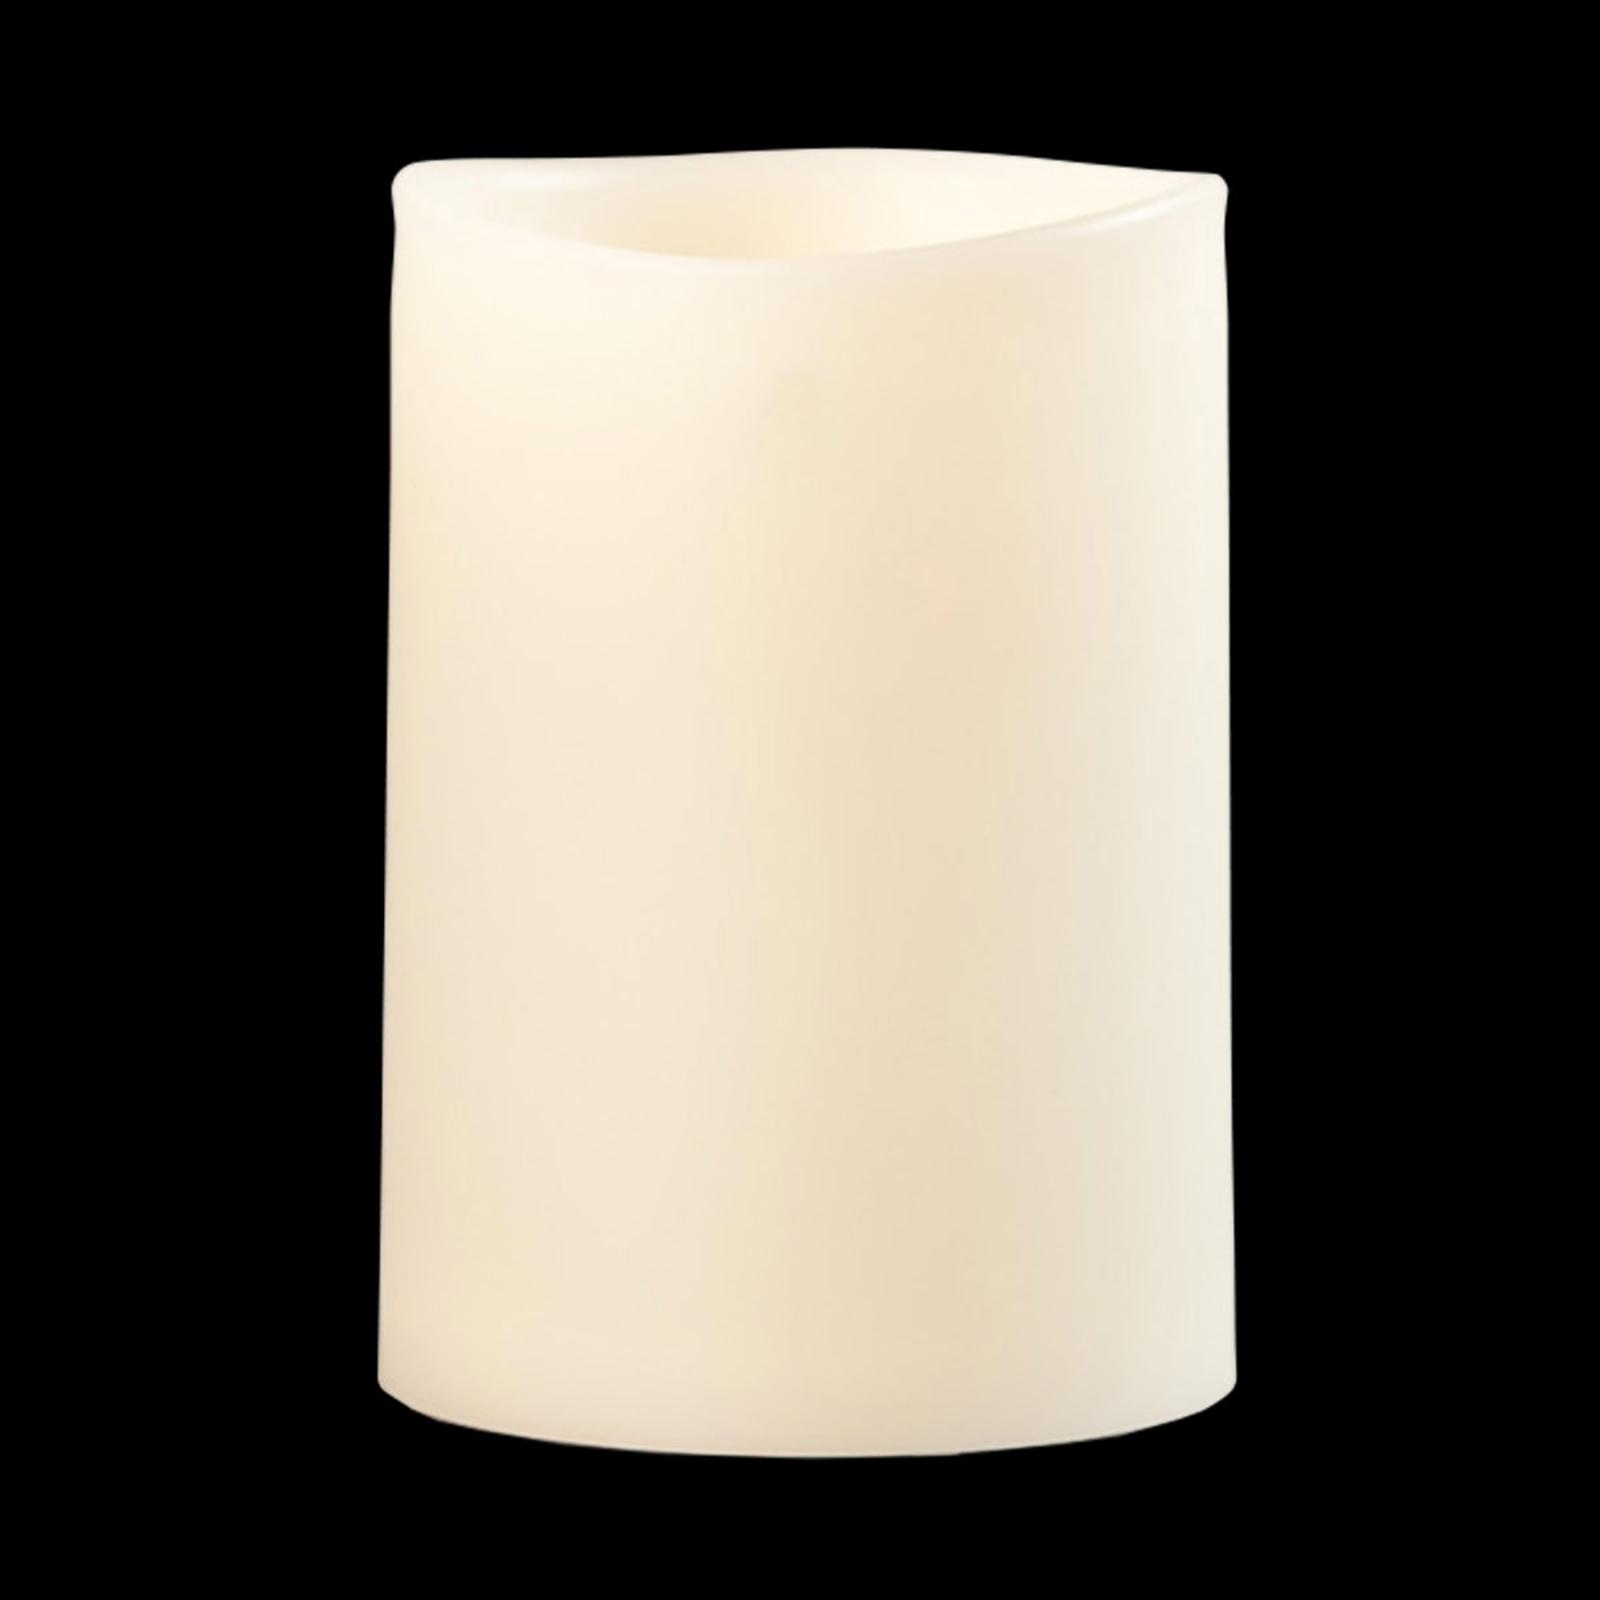 LED-Dekolicht Outdoor Candle 12,5 cm